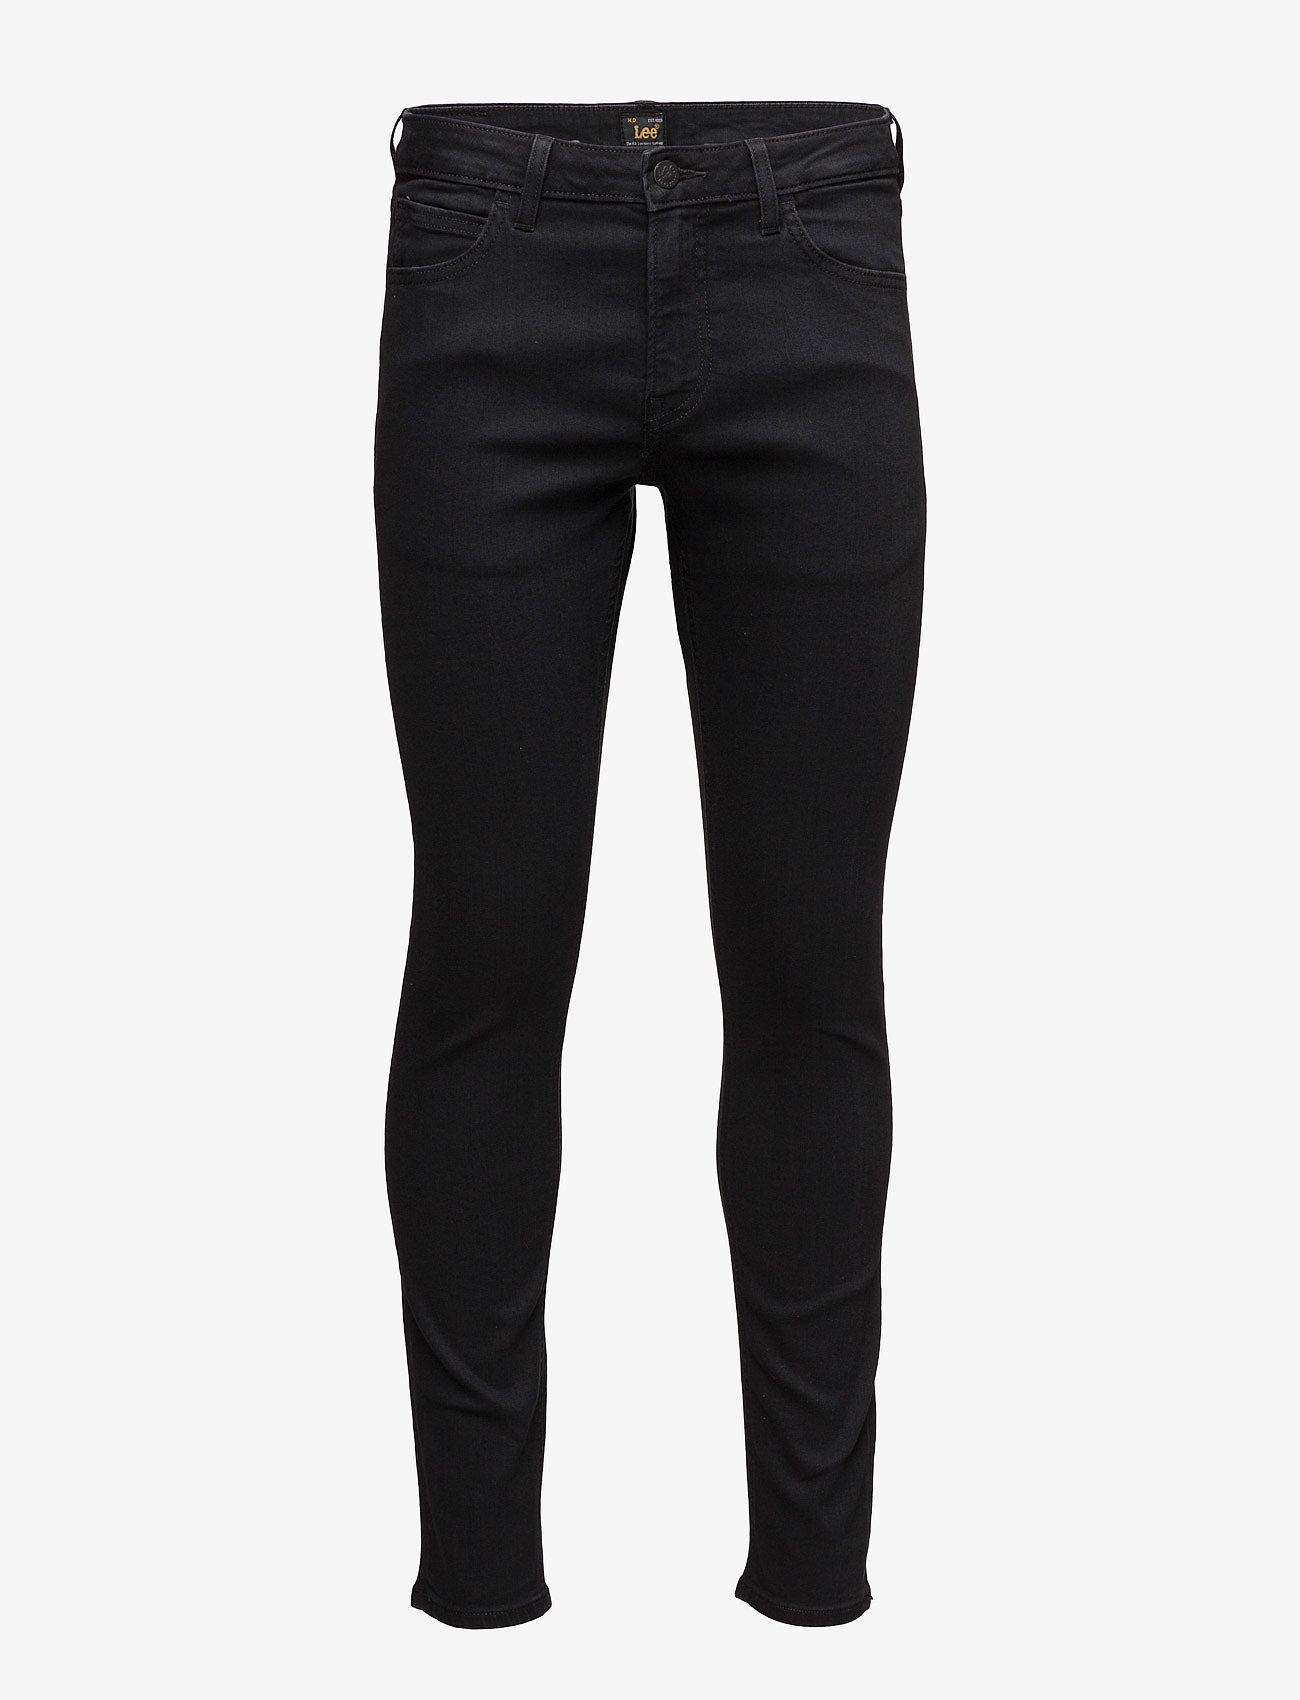 Lee Jeans - MALONE - skinny jeans - black rinse - 1